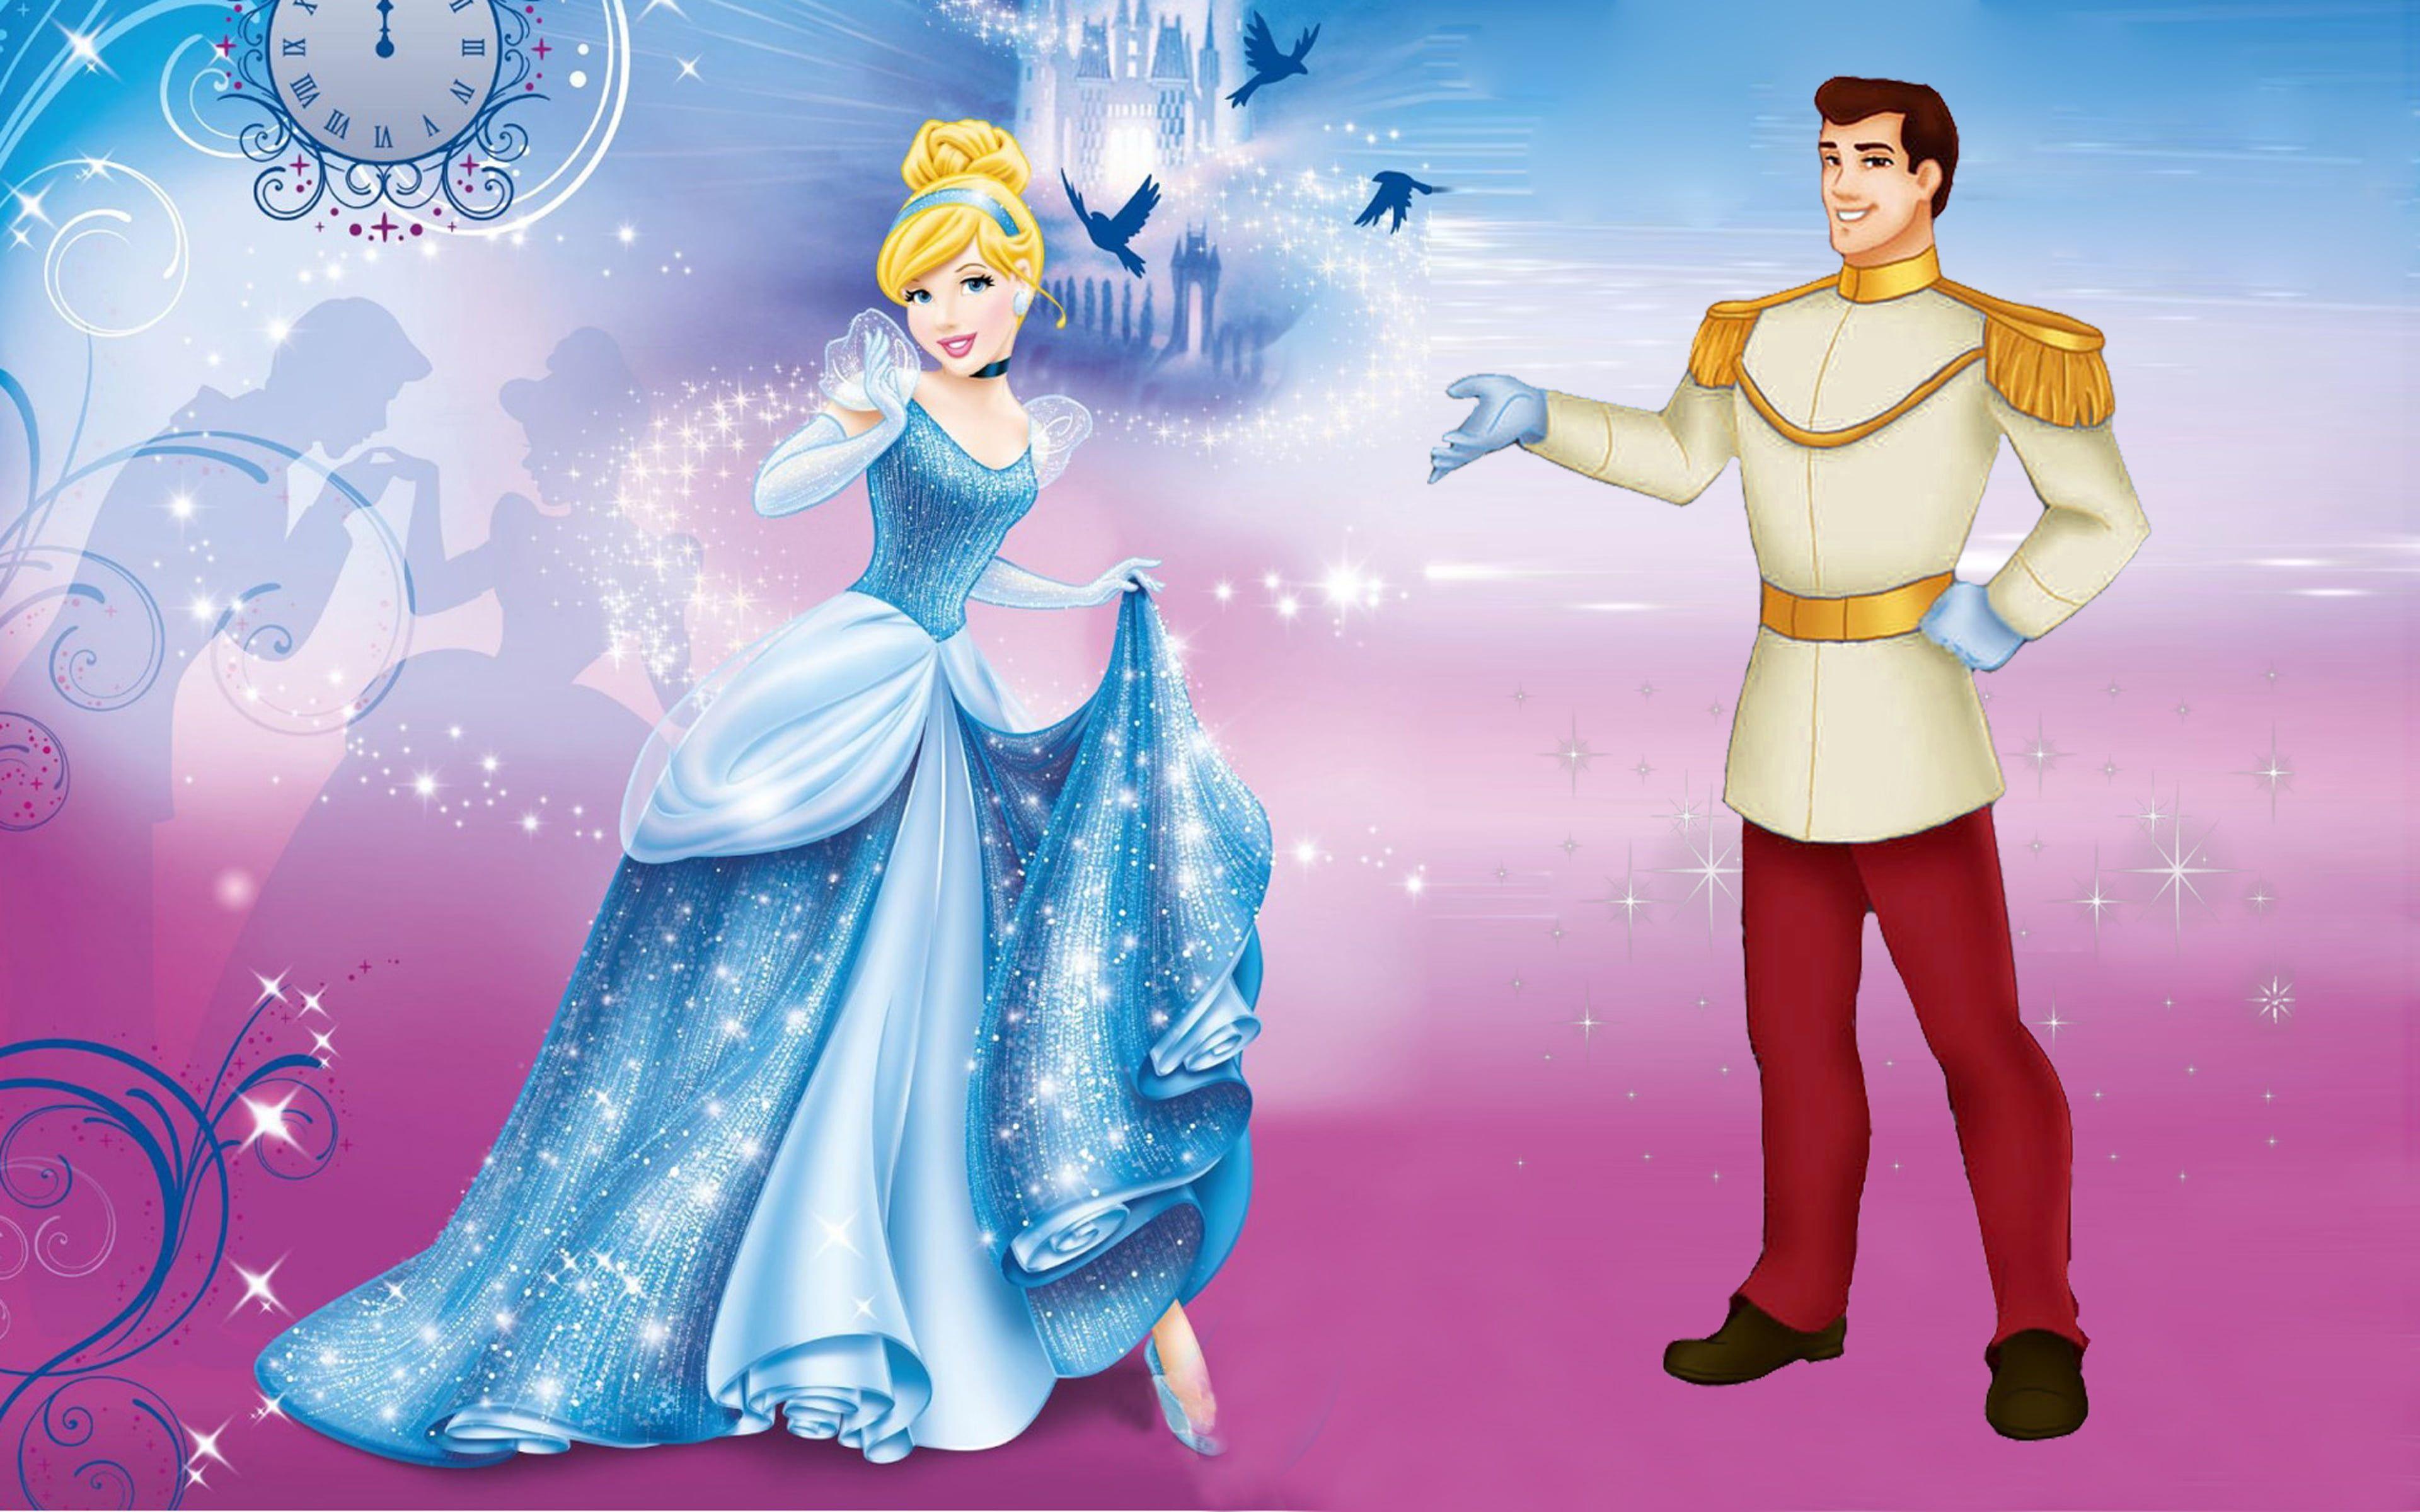 Disney Princess Cinderella And Prince Charming Desktop Backgrounds For Mobile Ph Cinderella And Prince Charming Disney Princess Cinderella Cinderella Wallpaper